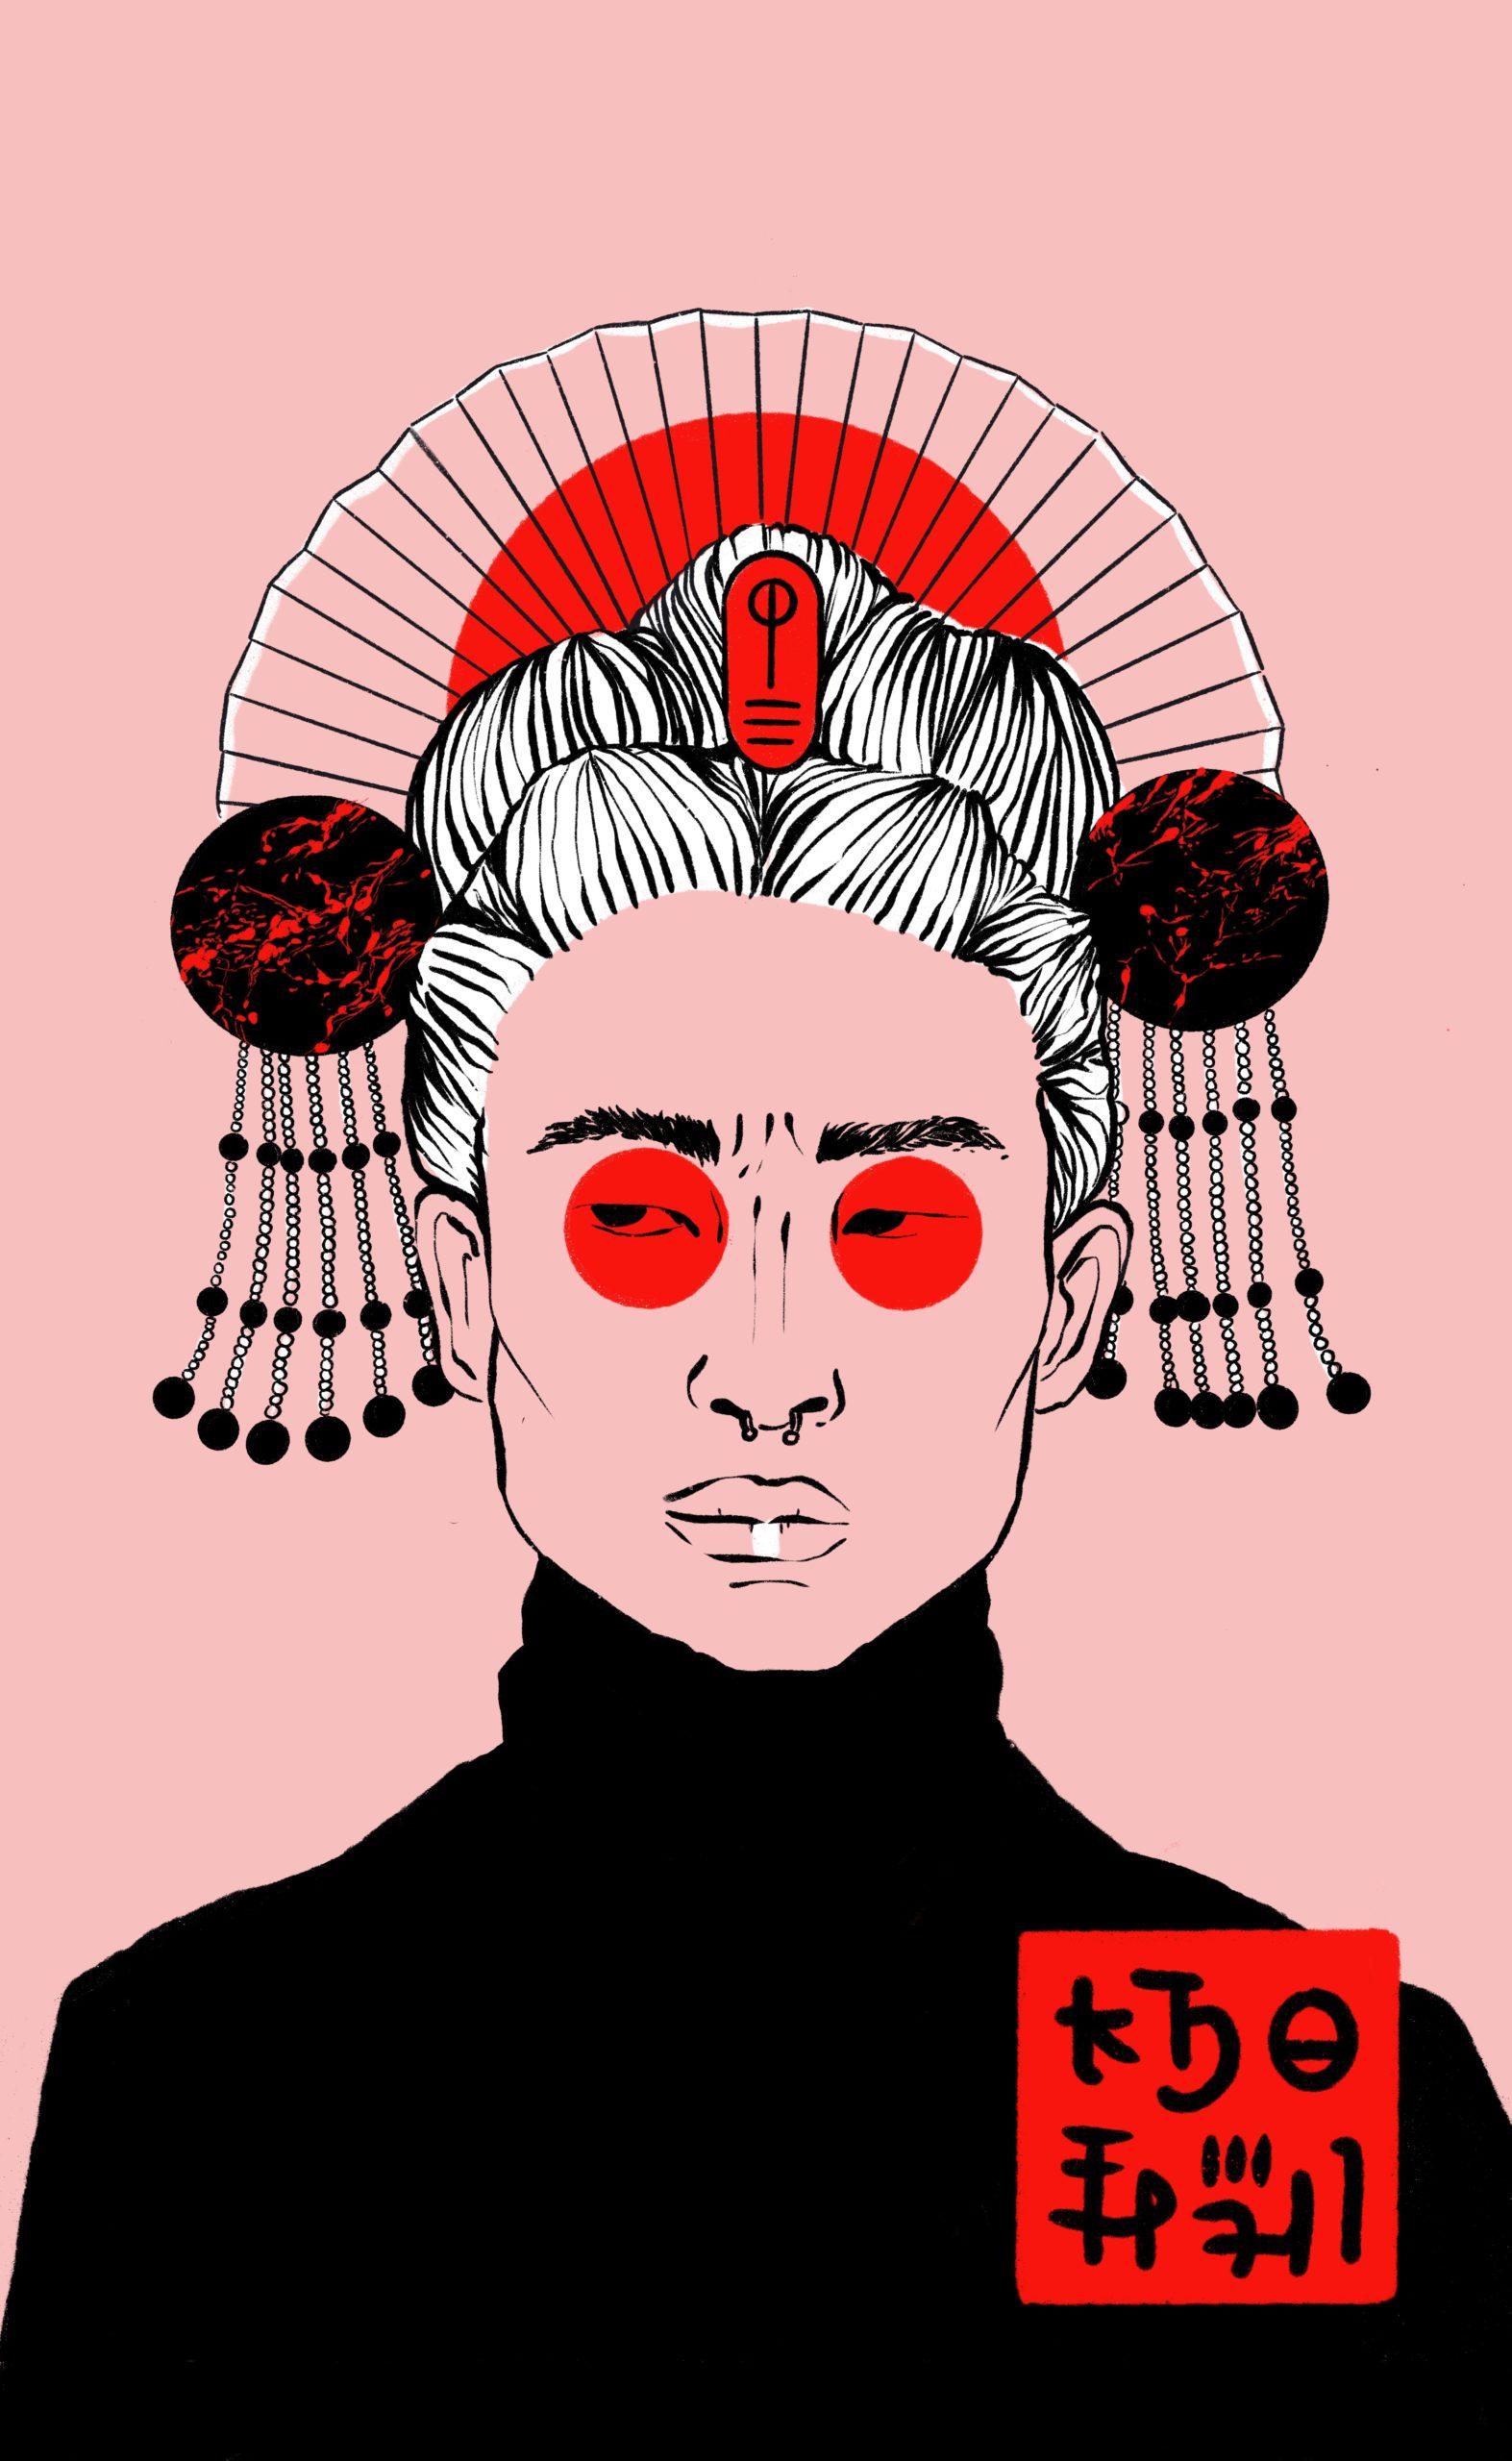 Illustration Procreate Black Outline Asian Trans Fan Schmuck Rosa Pink Circles Red Rollkragenpullover Japan